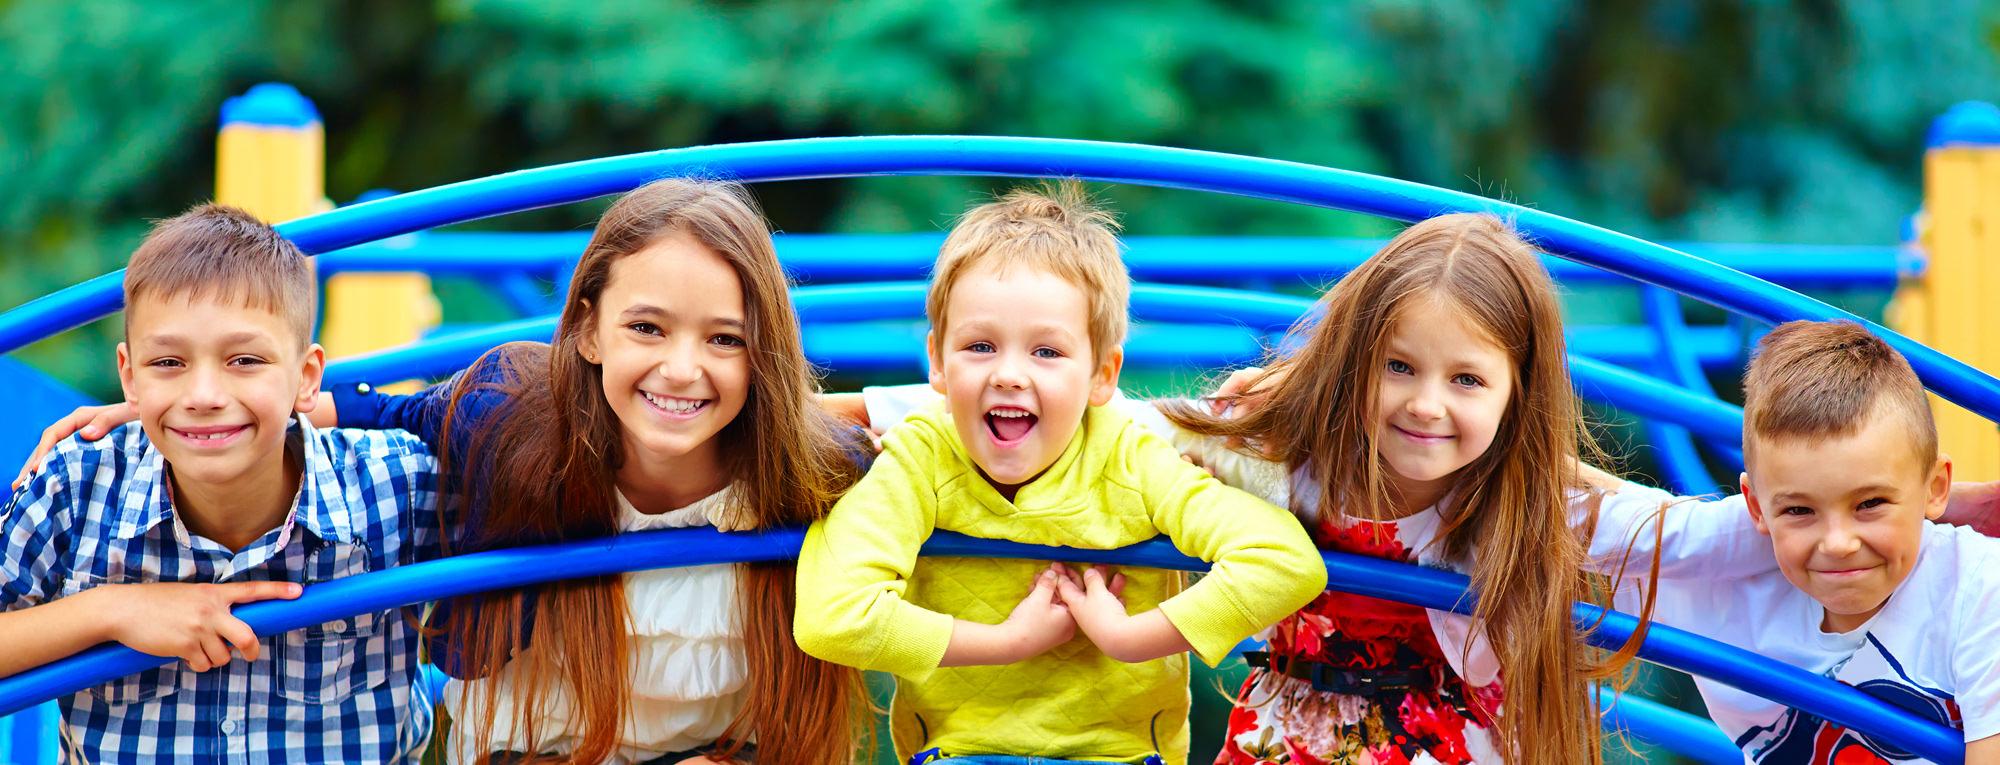 students sitting on playground equipment